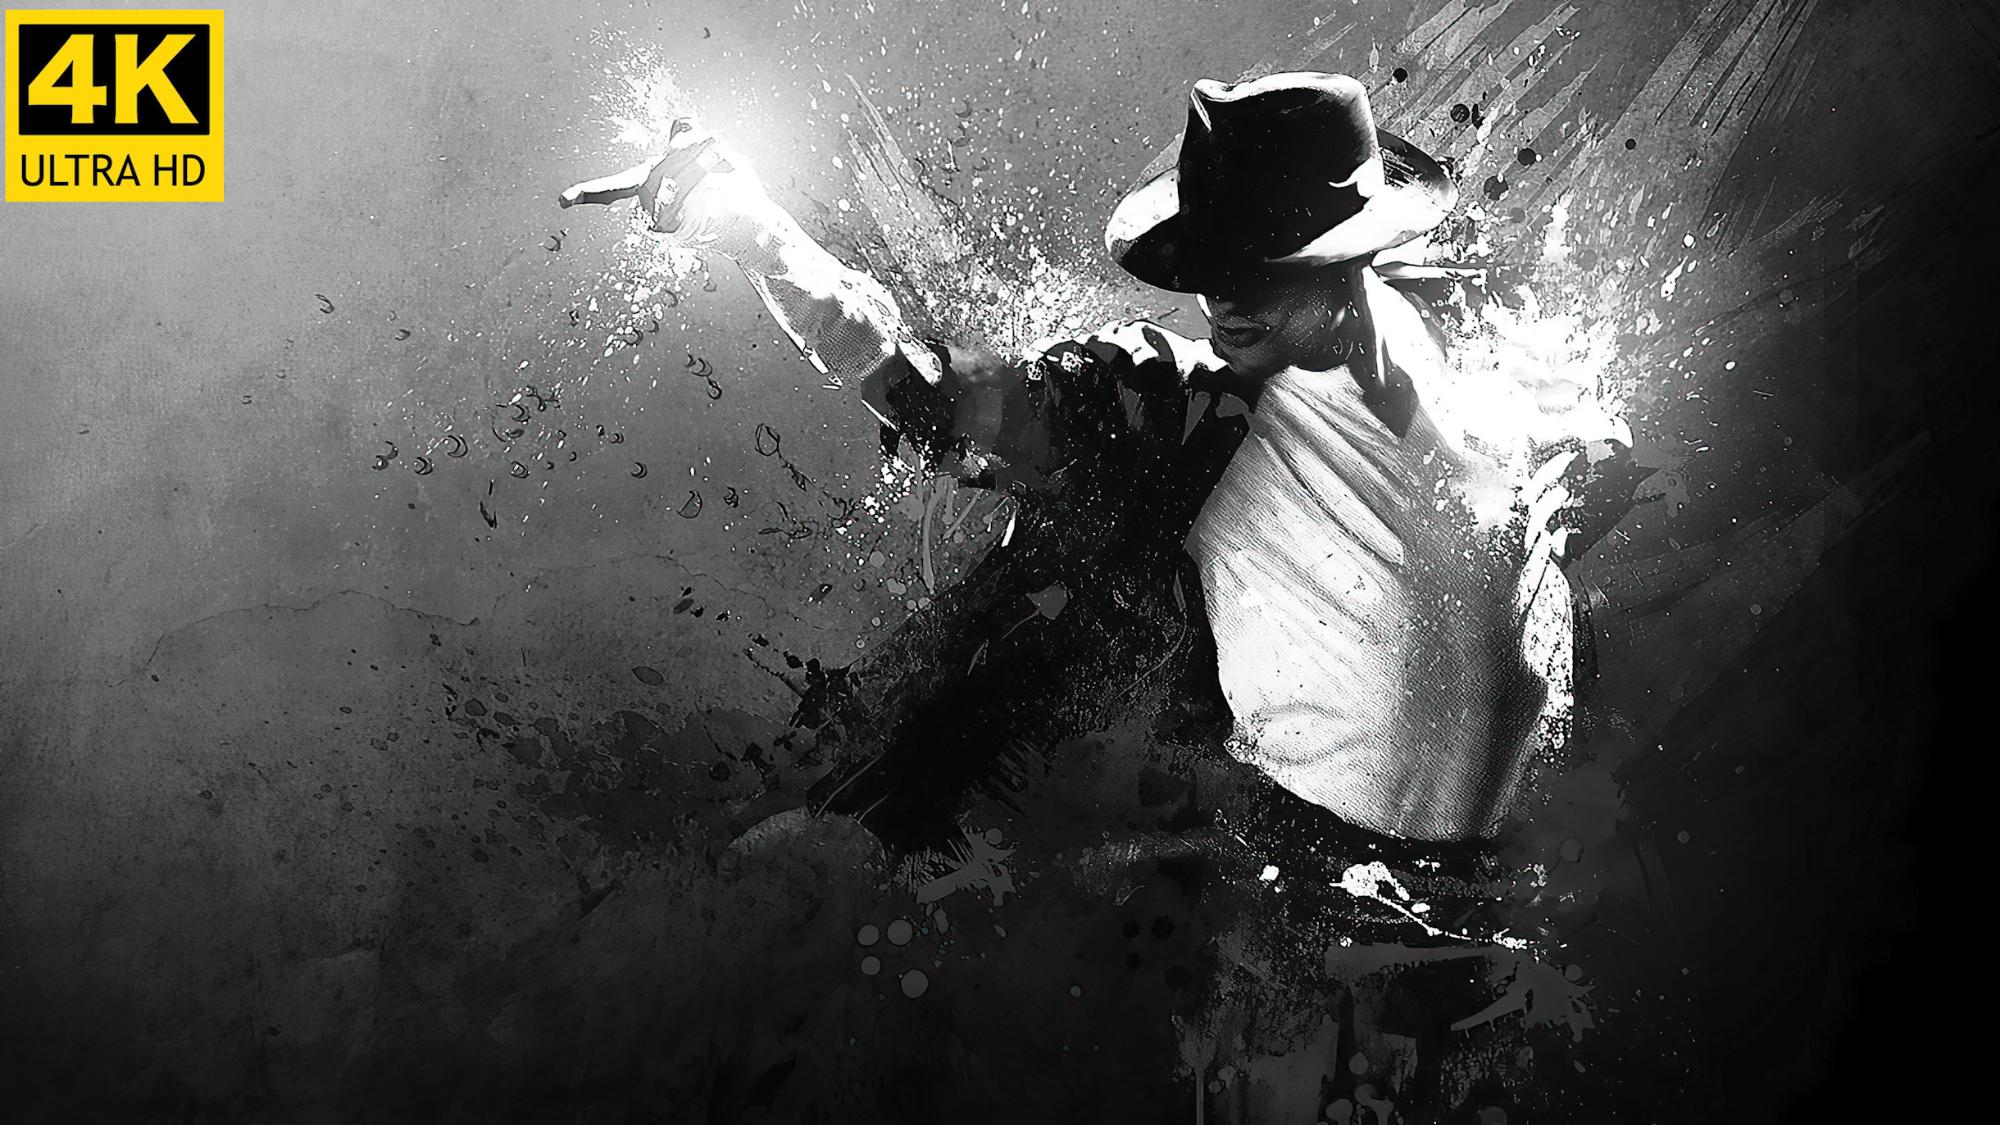 【4k修复60帧】Michael.Jackson全mv合集【收藏级别画质】【更新5首】